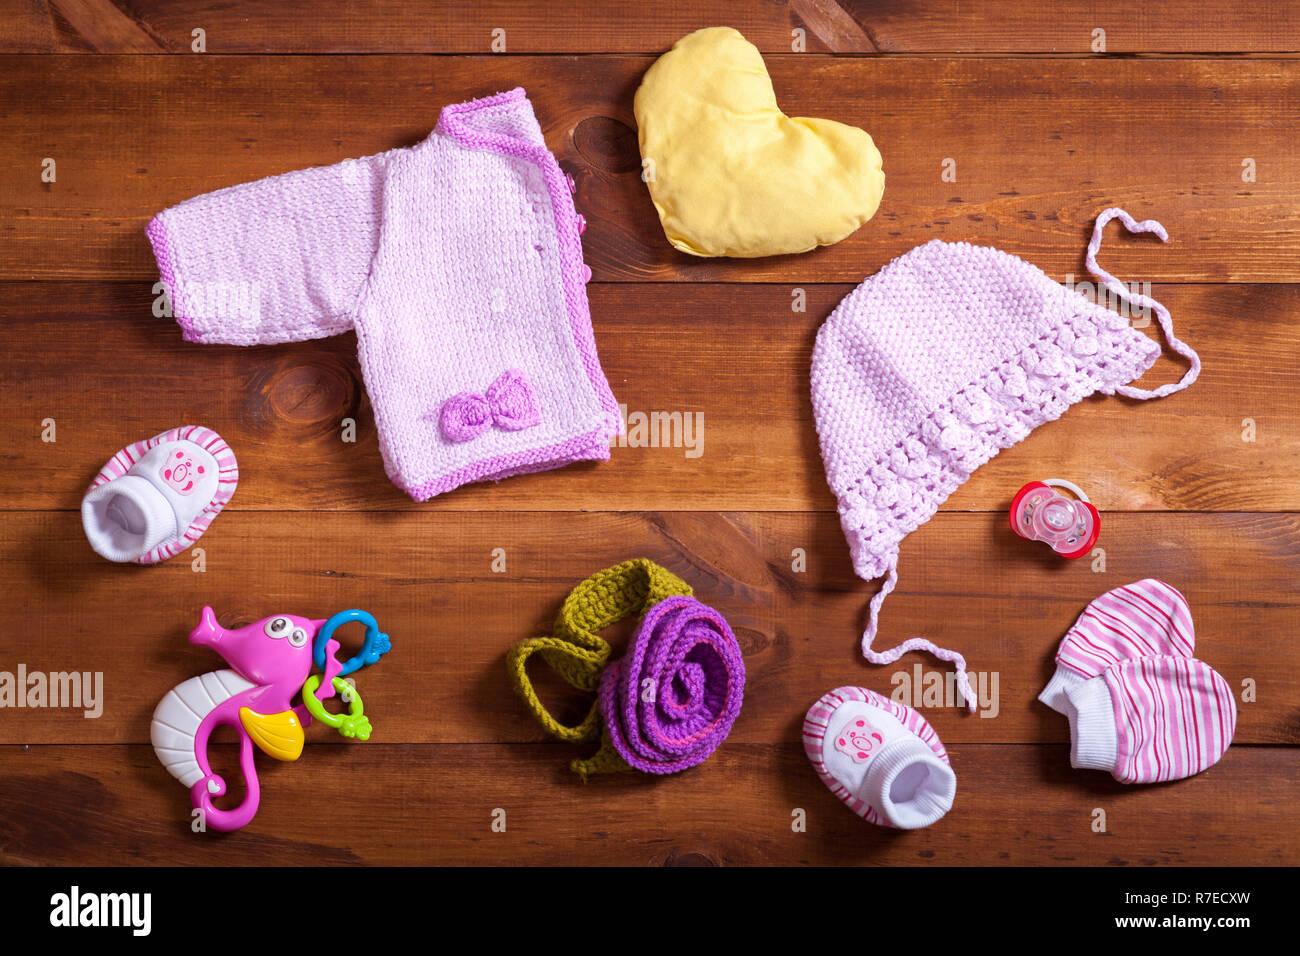 80dcd40b5b536 Vêtements de bébé set concept